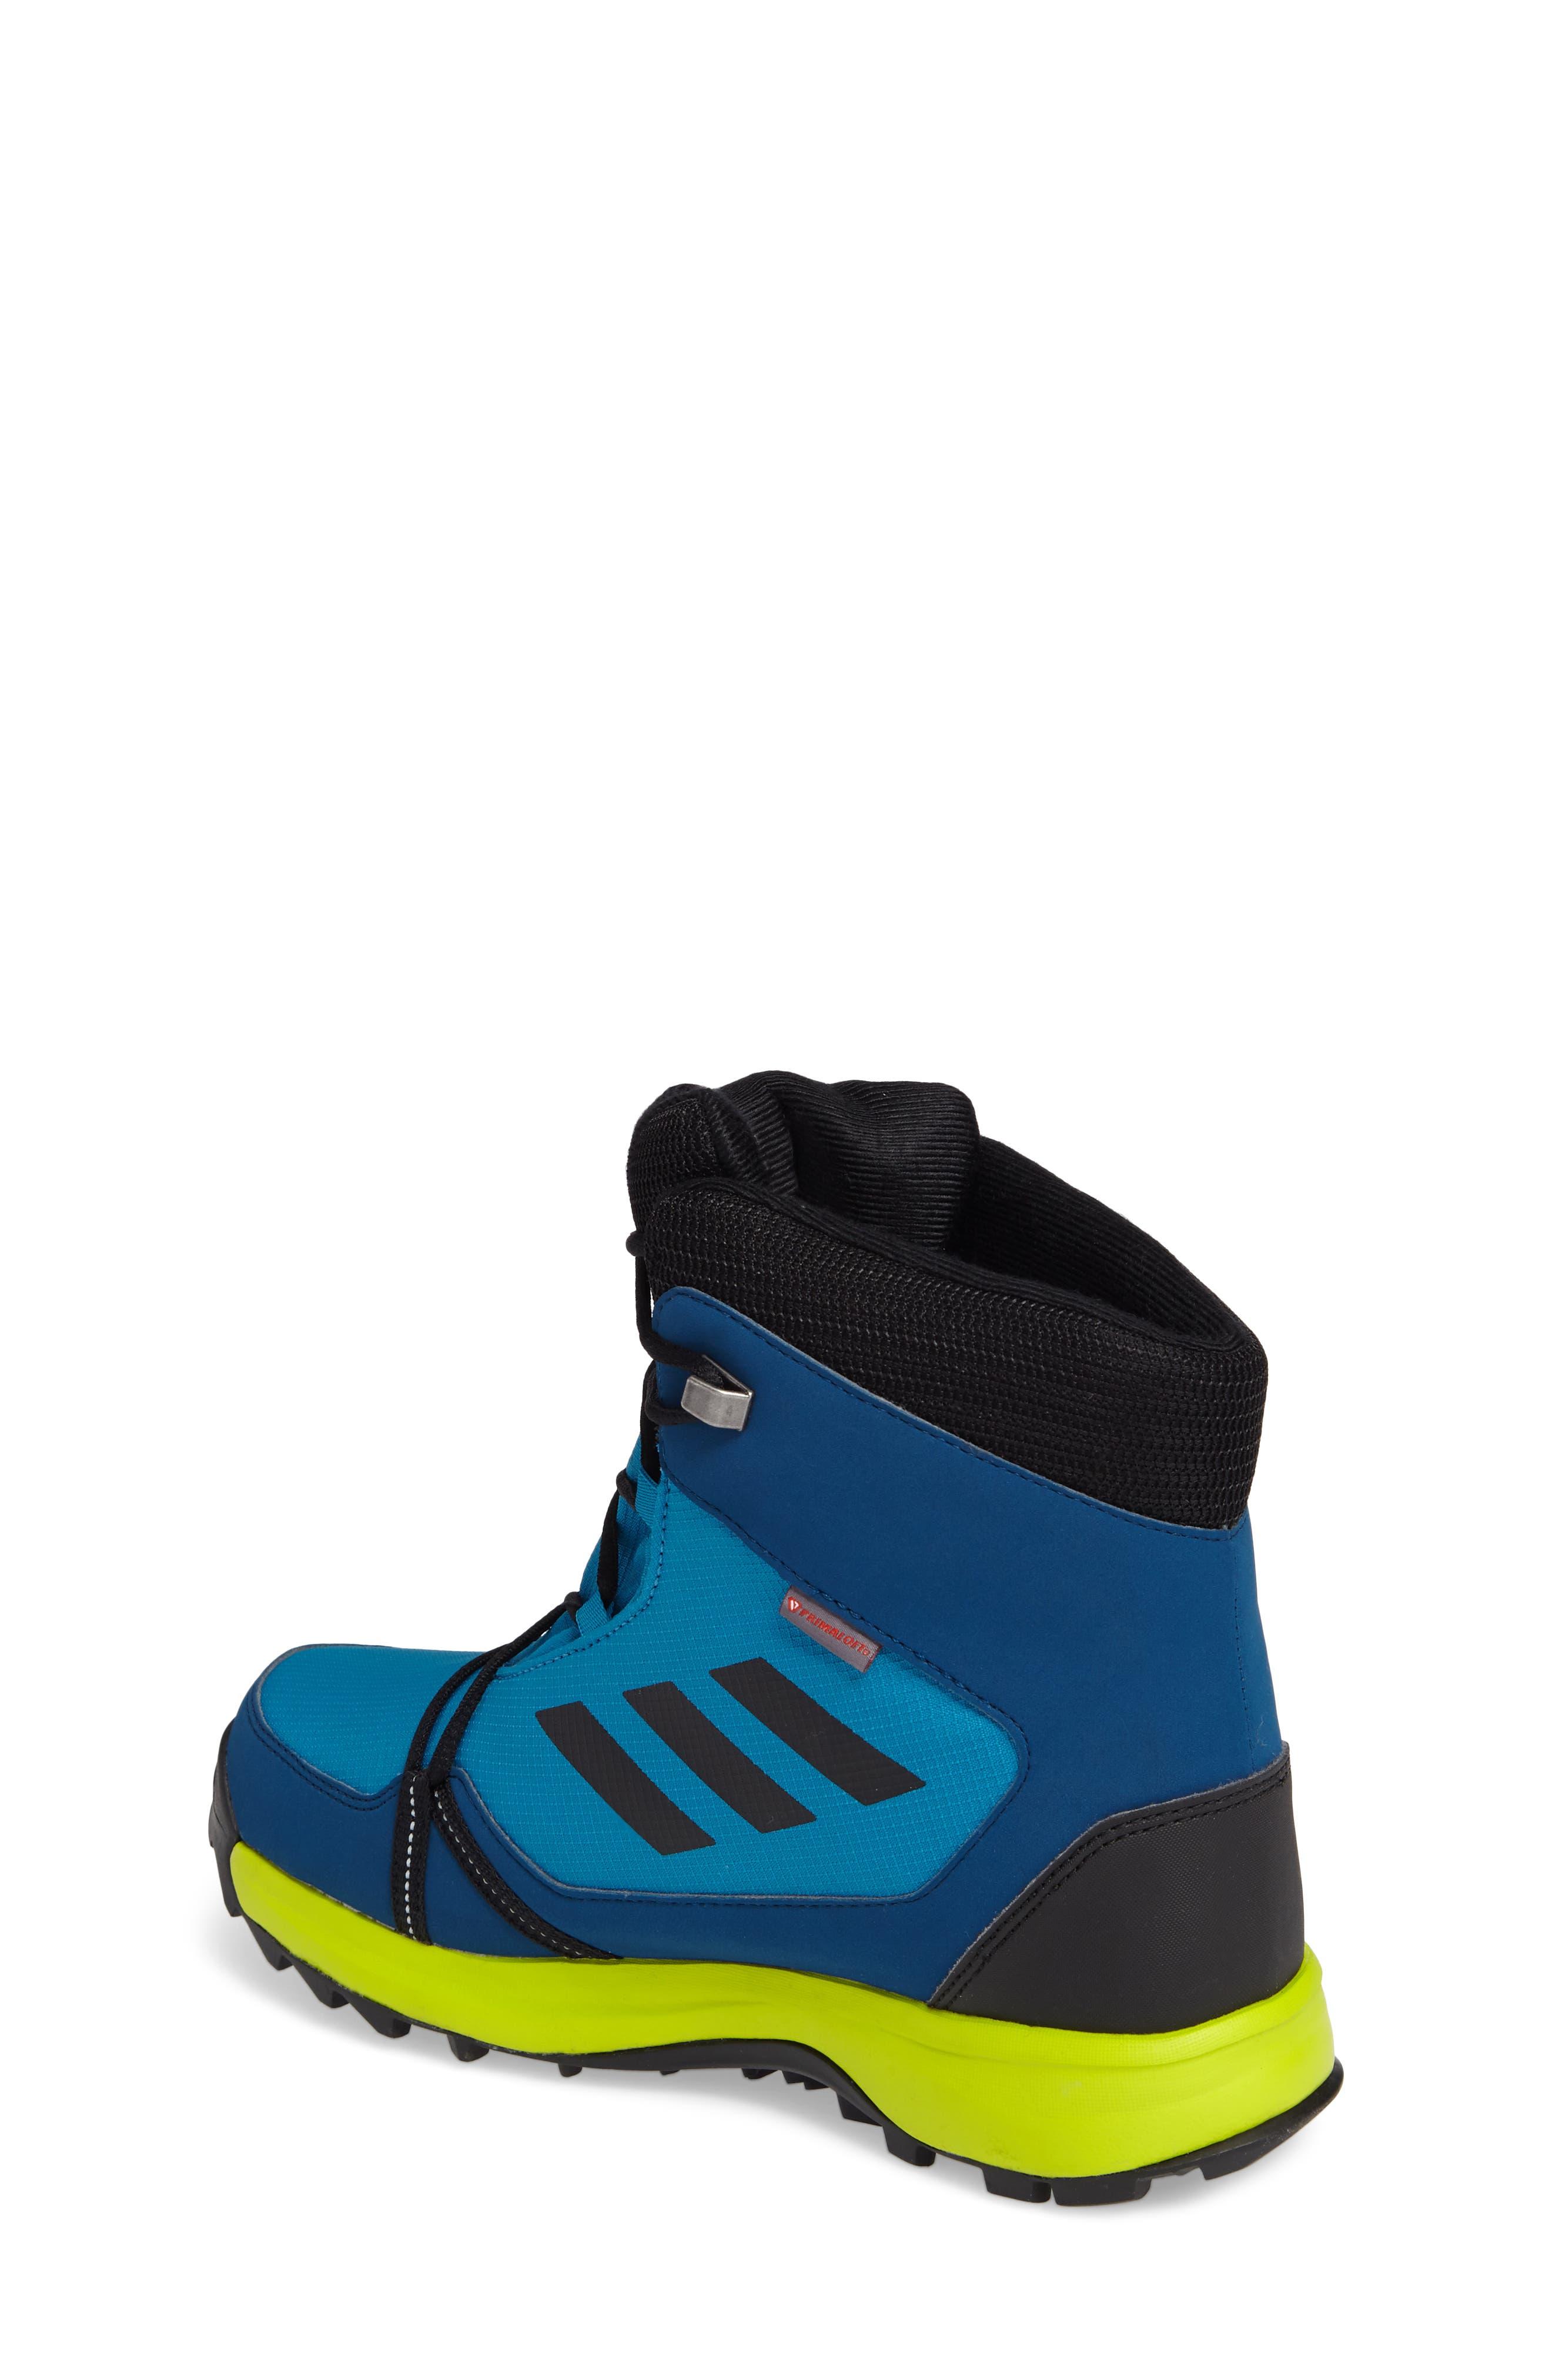 Terrex Snow Sneaker Boot,                             Alternate thumbnail 4, color,